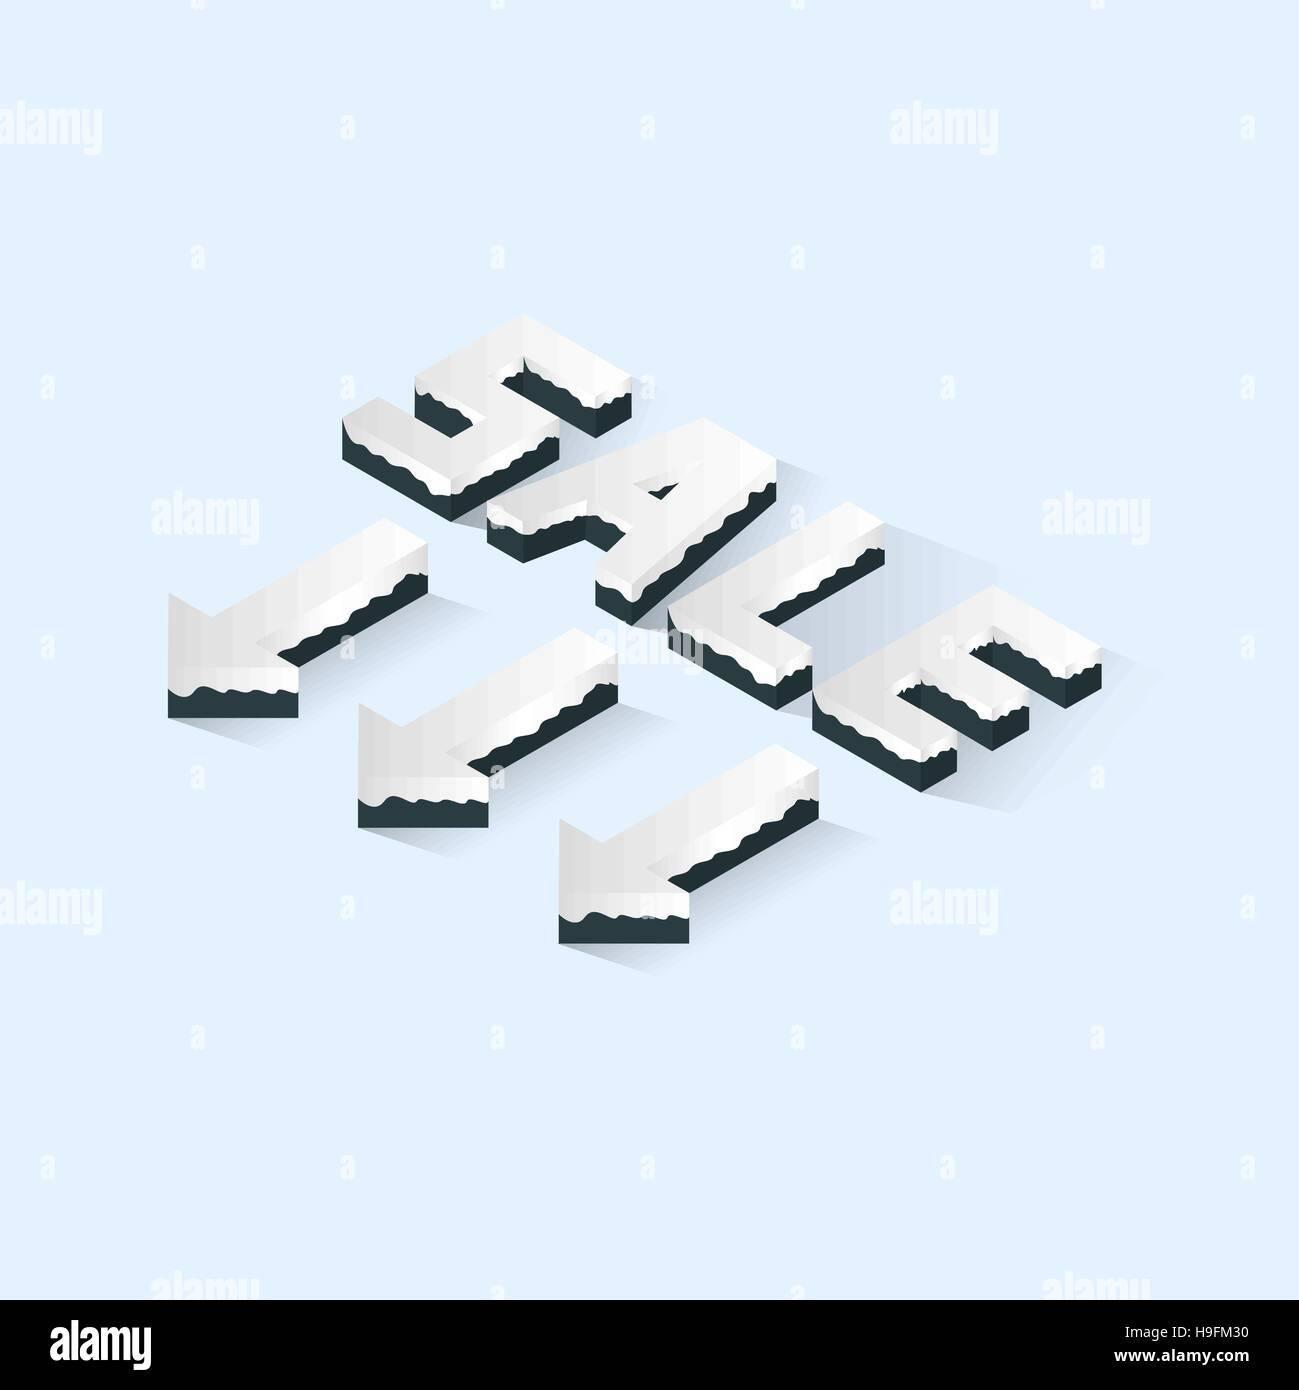 Isometric Snowy Sale Text - Stock Image